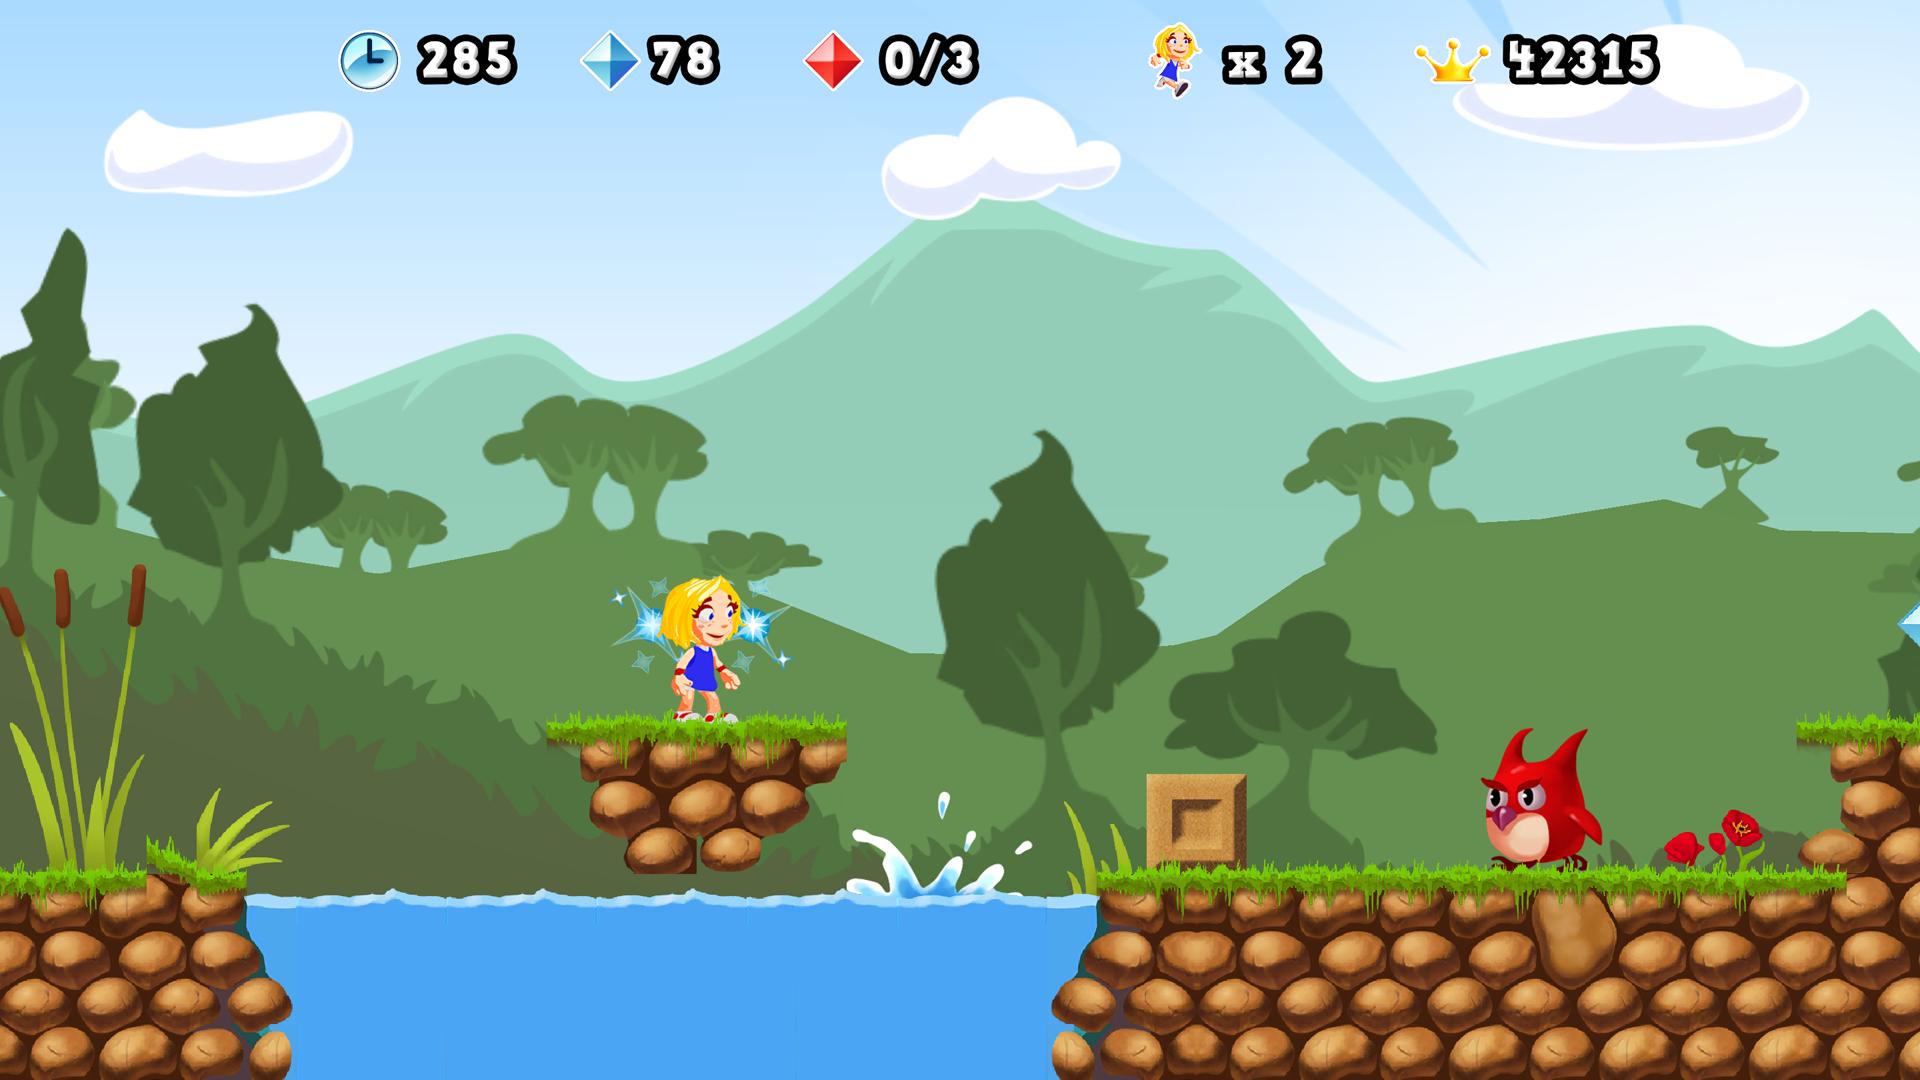 Screenshot 14 of 14